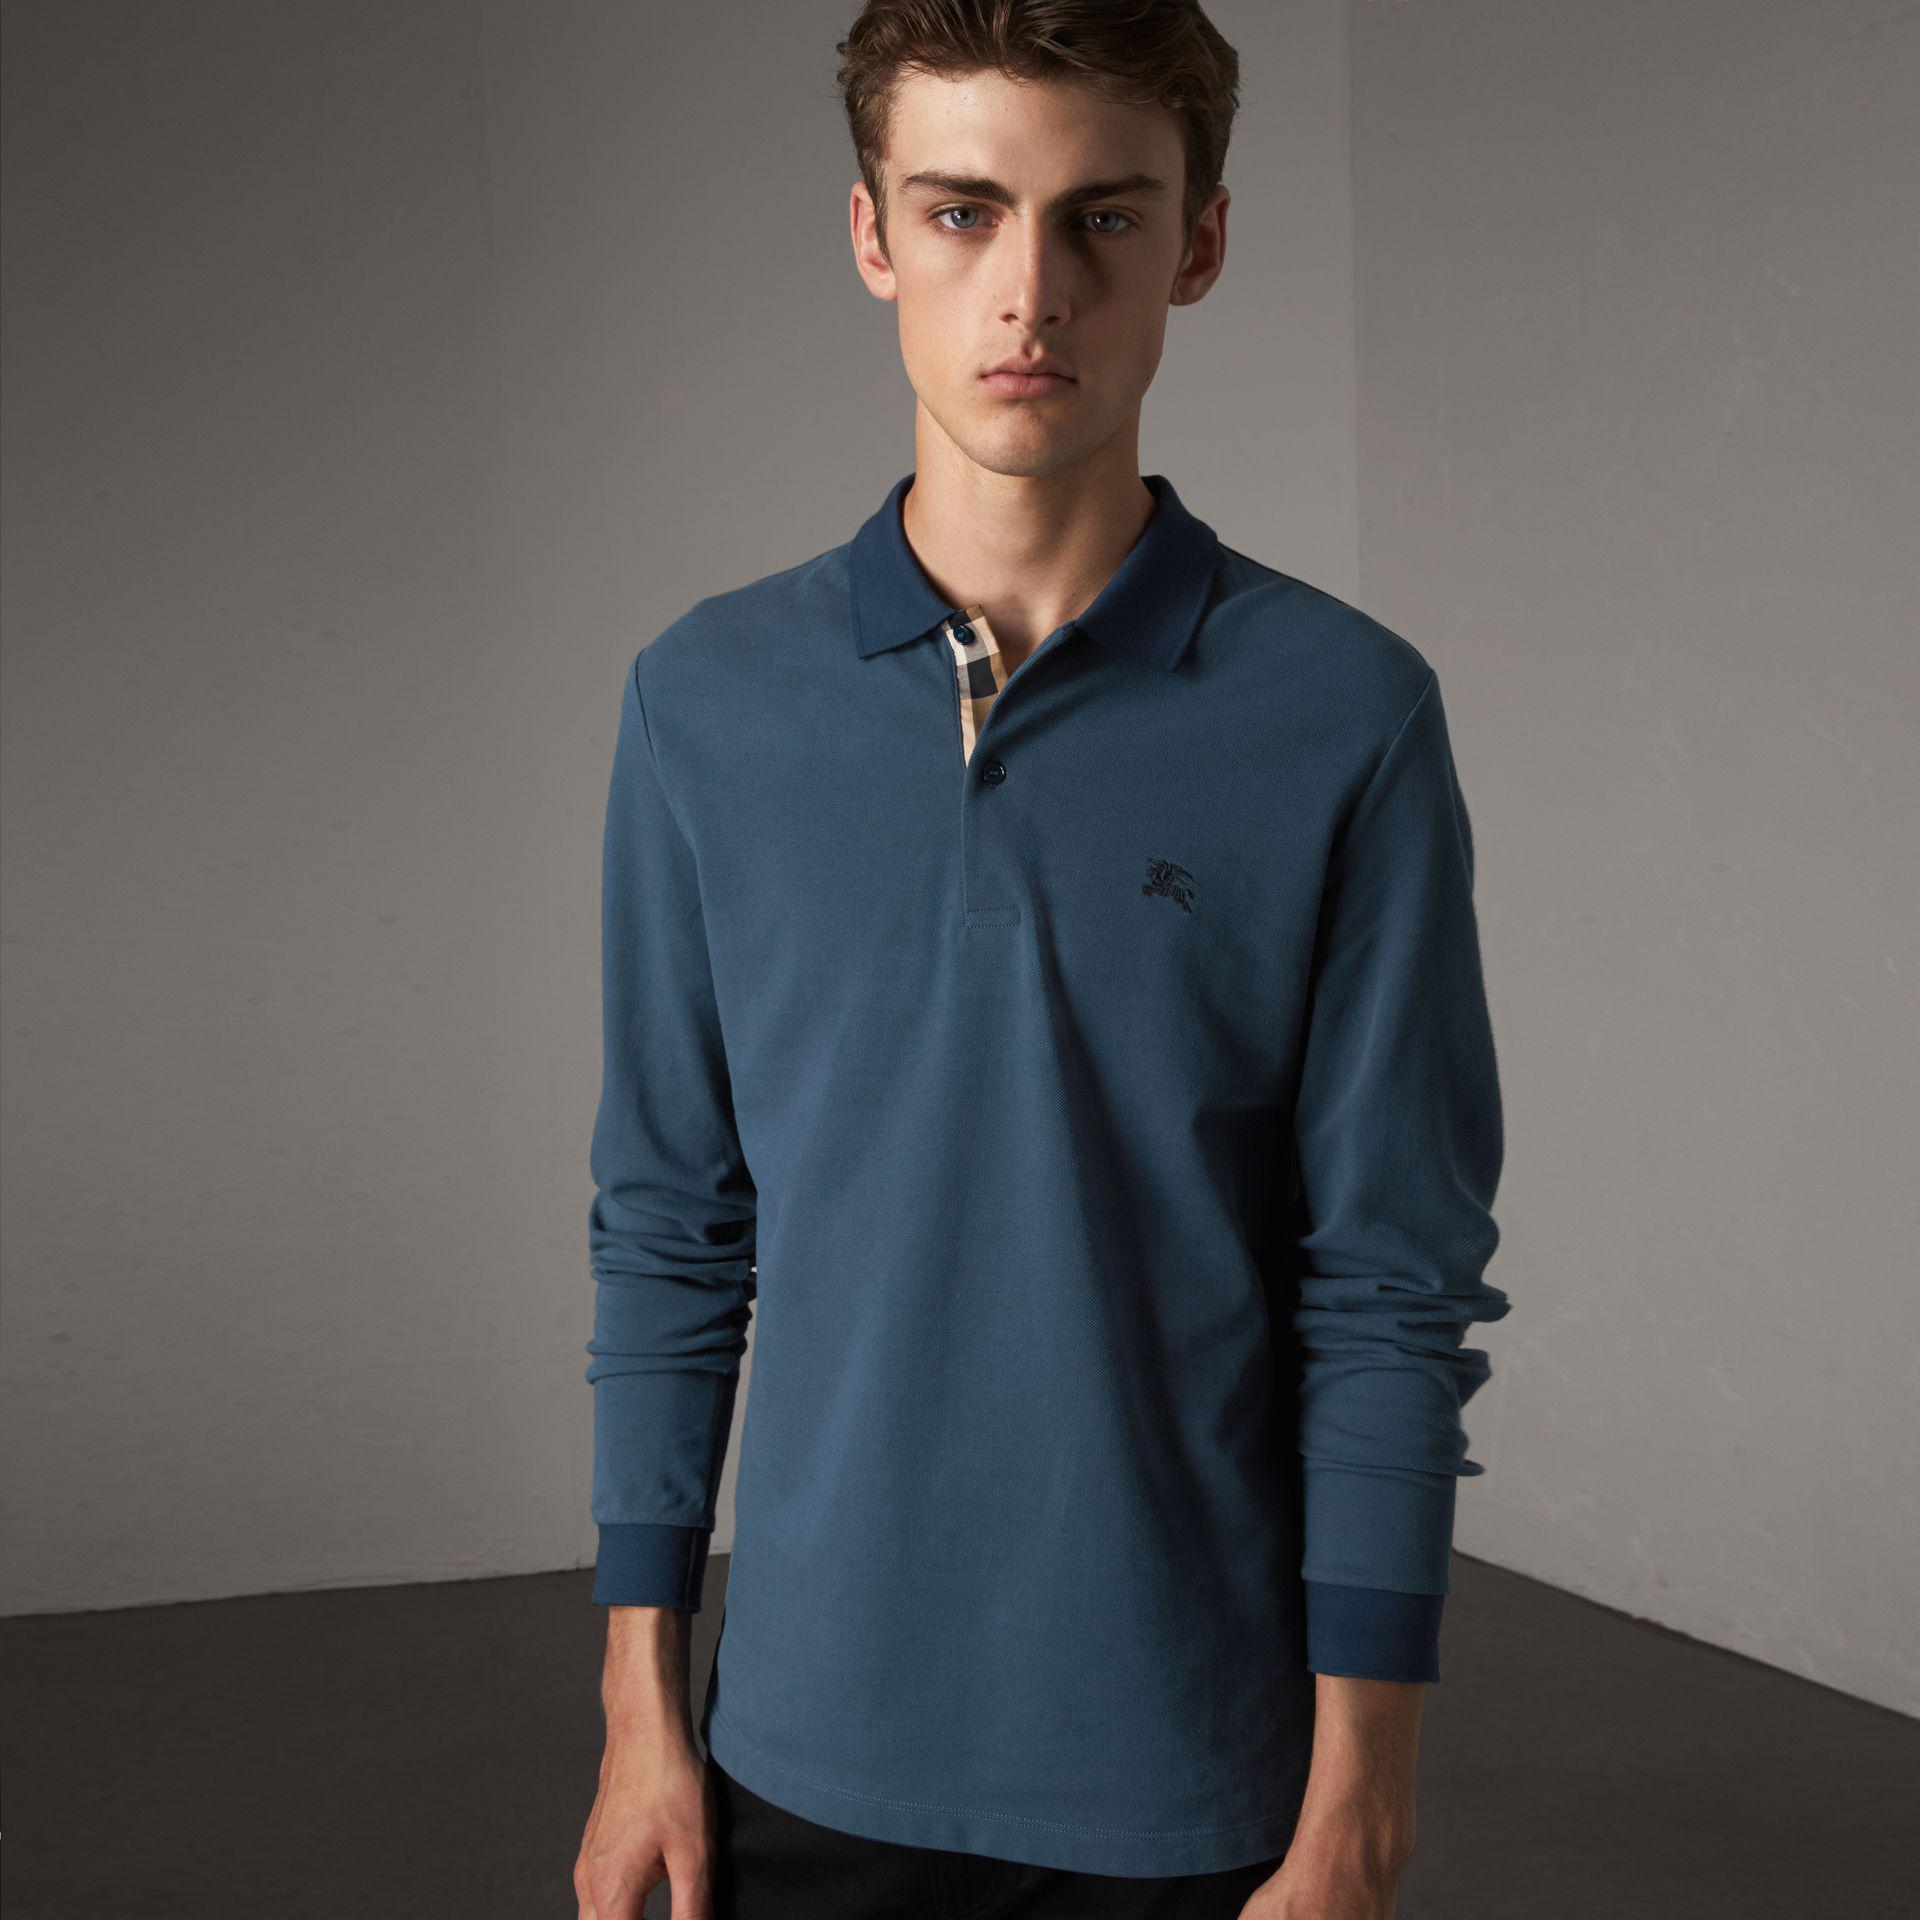 7d30bac64879 Burberry Brit Mens Short Sleeve Cotton Pique Polo Shirt - BCD Tofu House